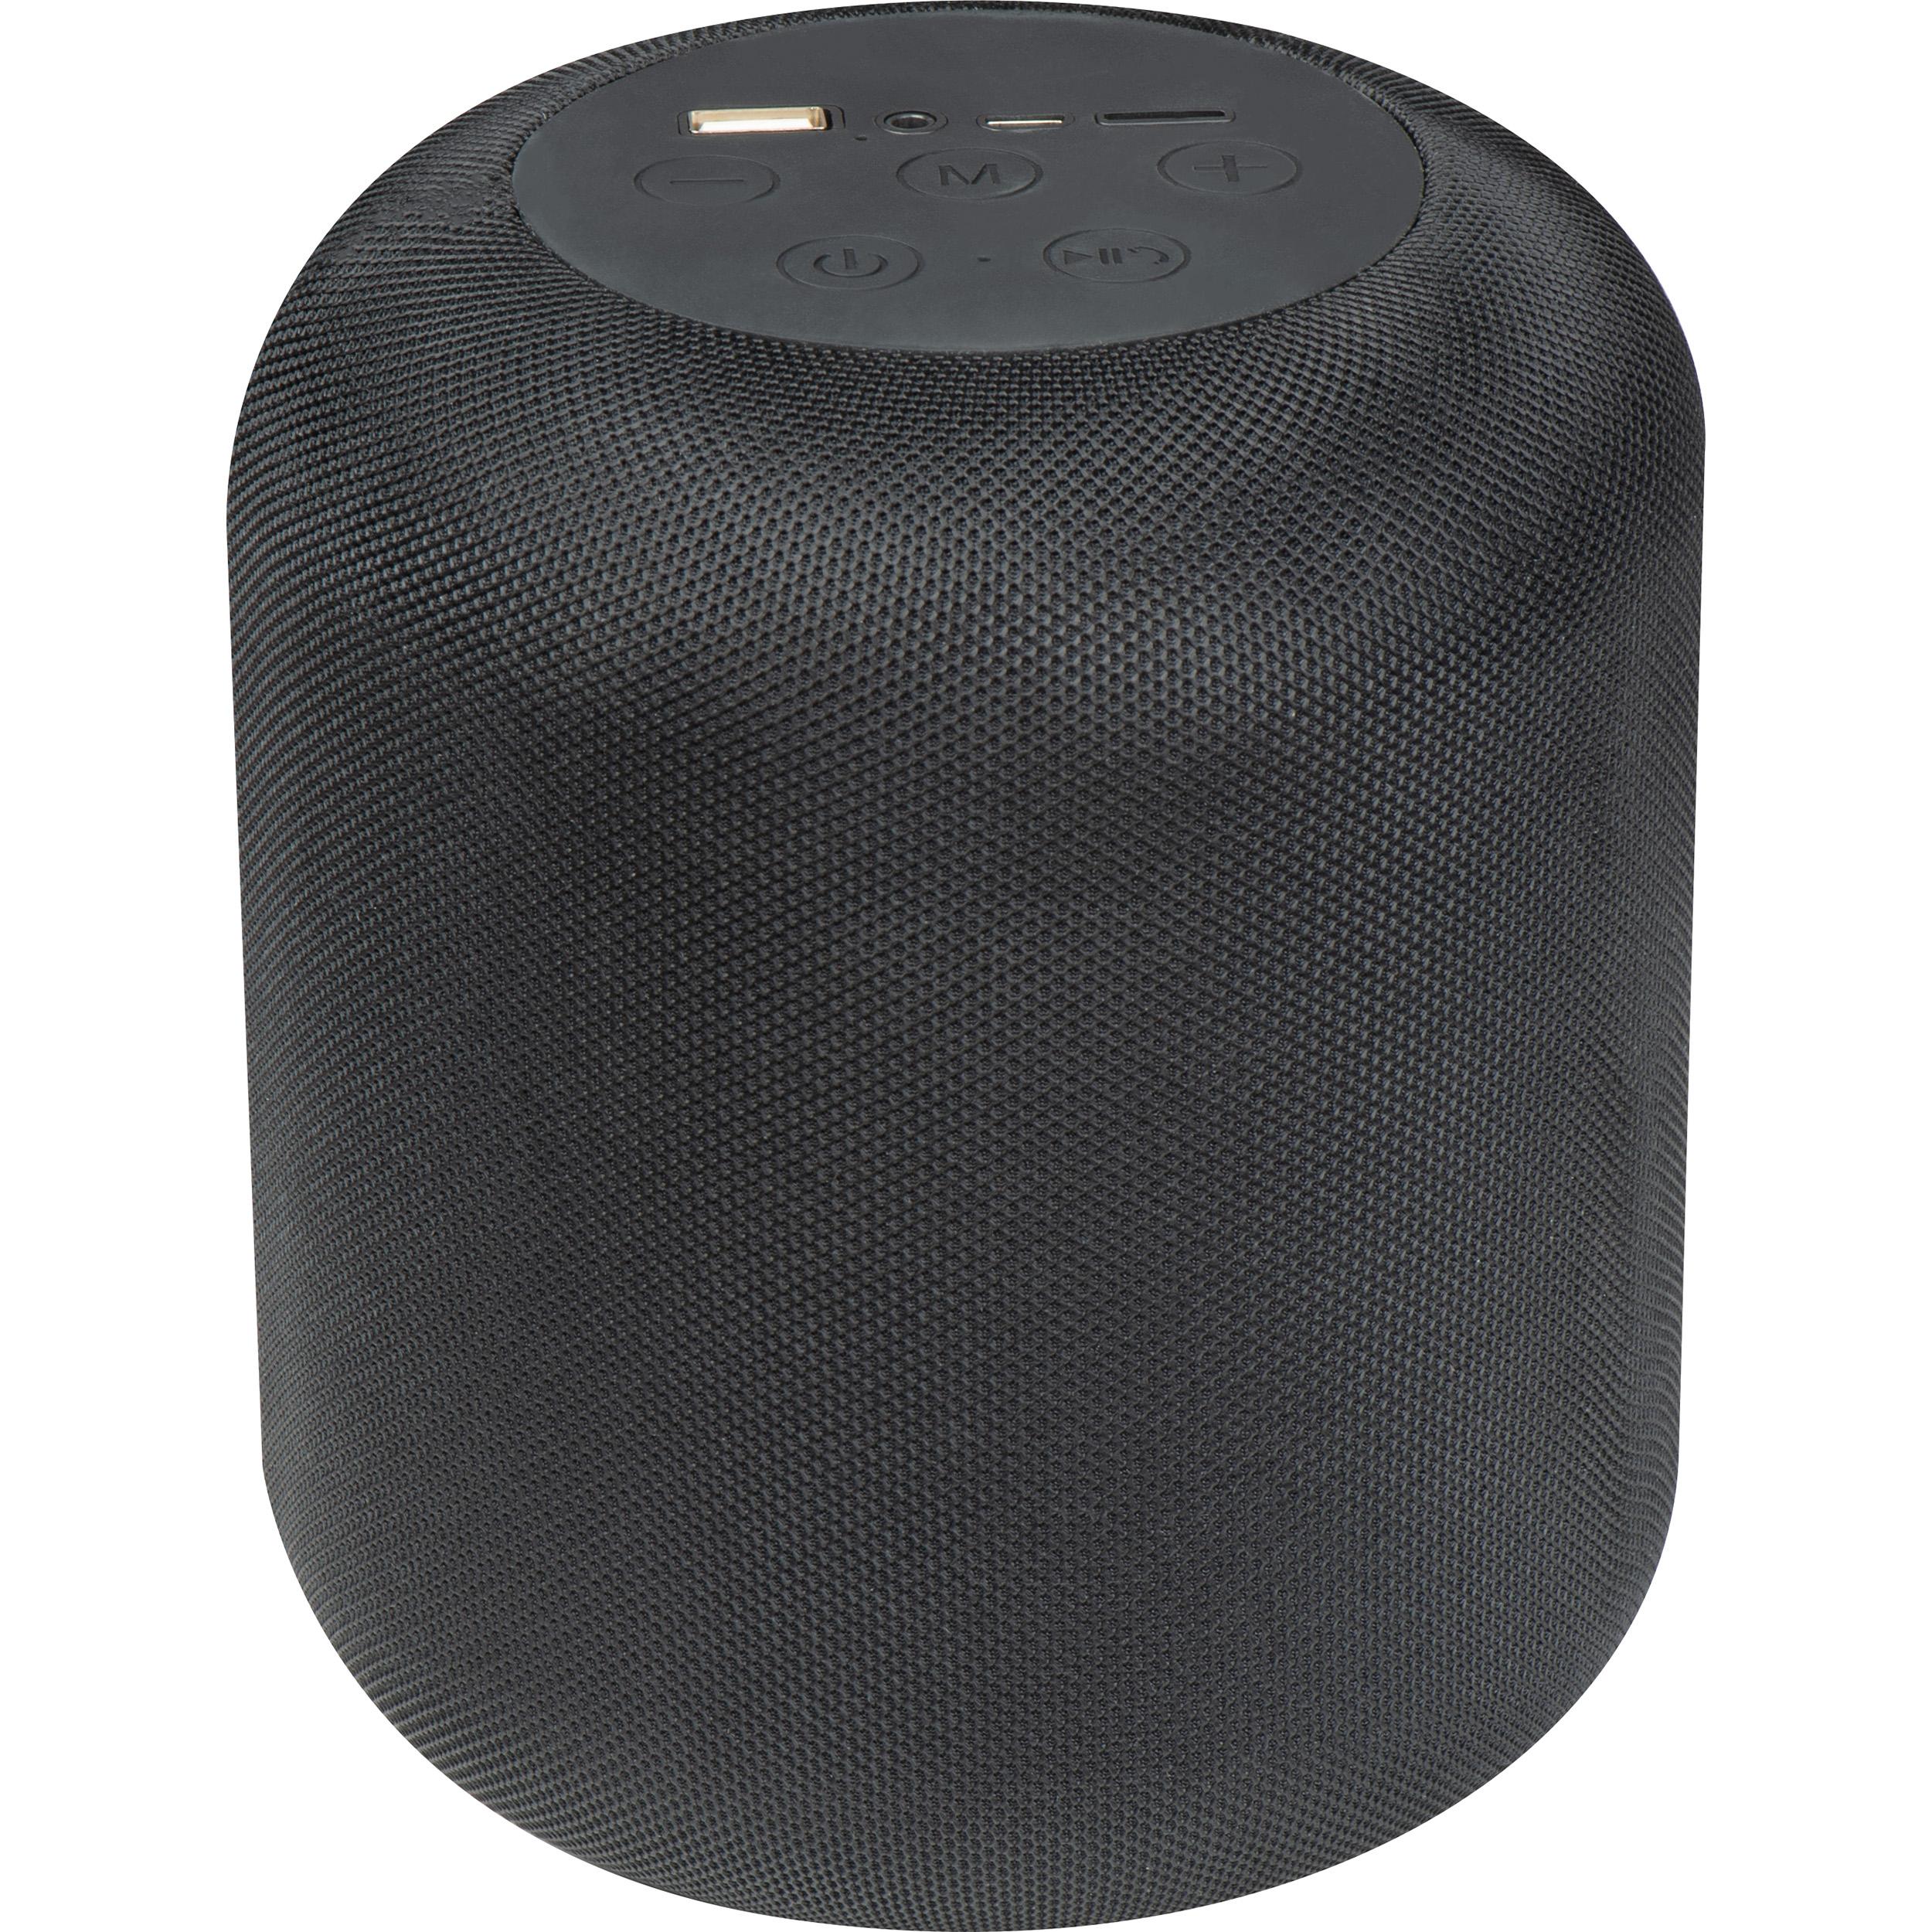 High-quality bluetooth speaker